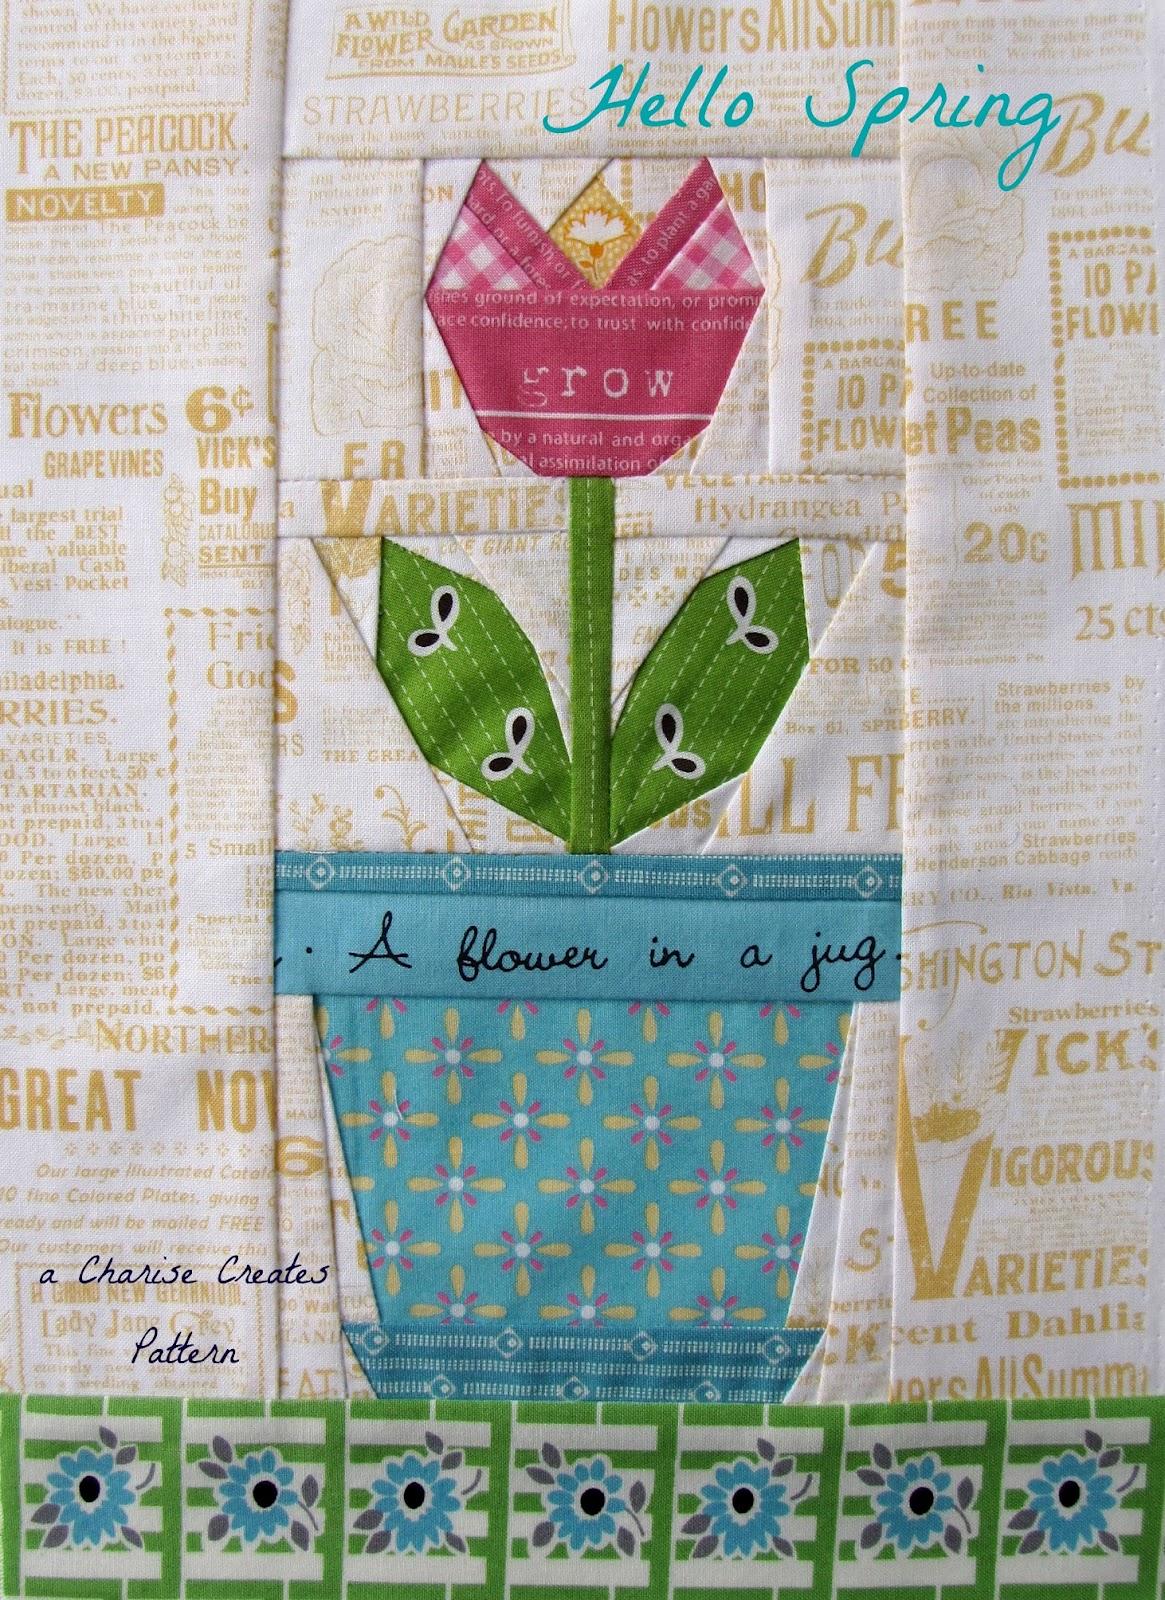 Charise Creates Hello Spring Tulip Amp Tote Bag